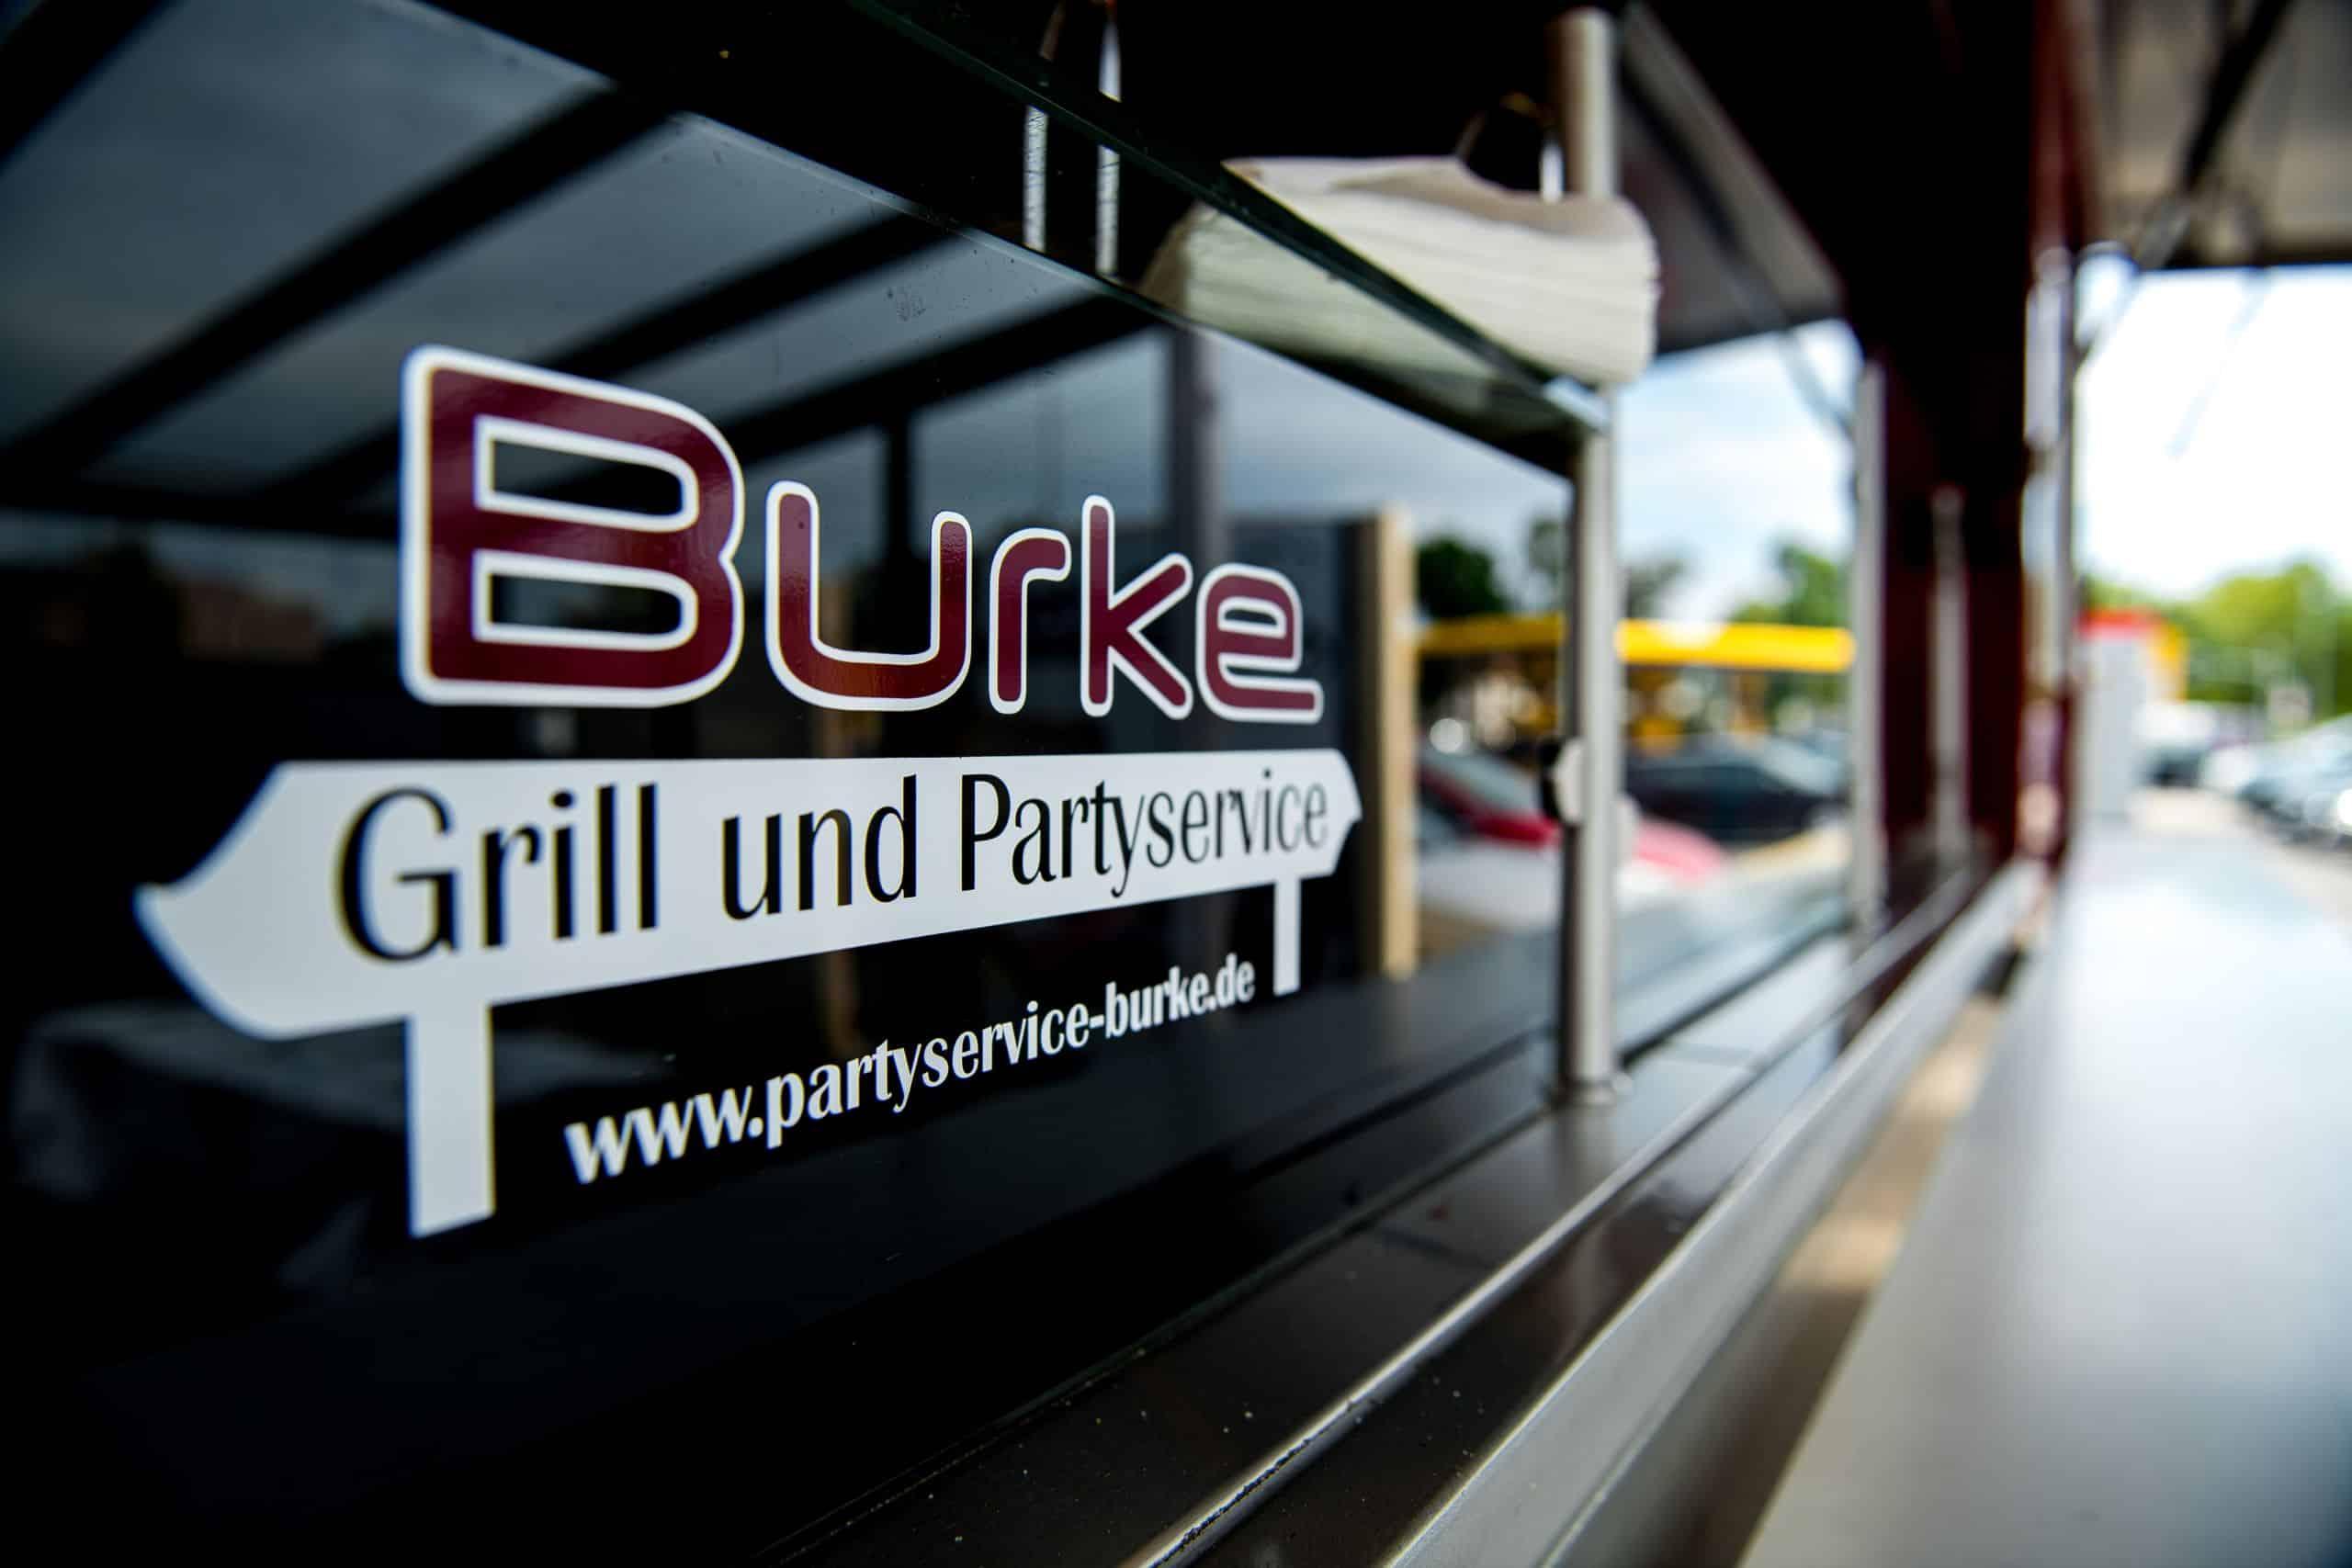 Partyservice Burke